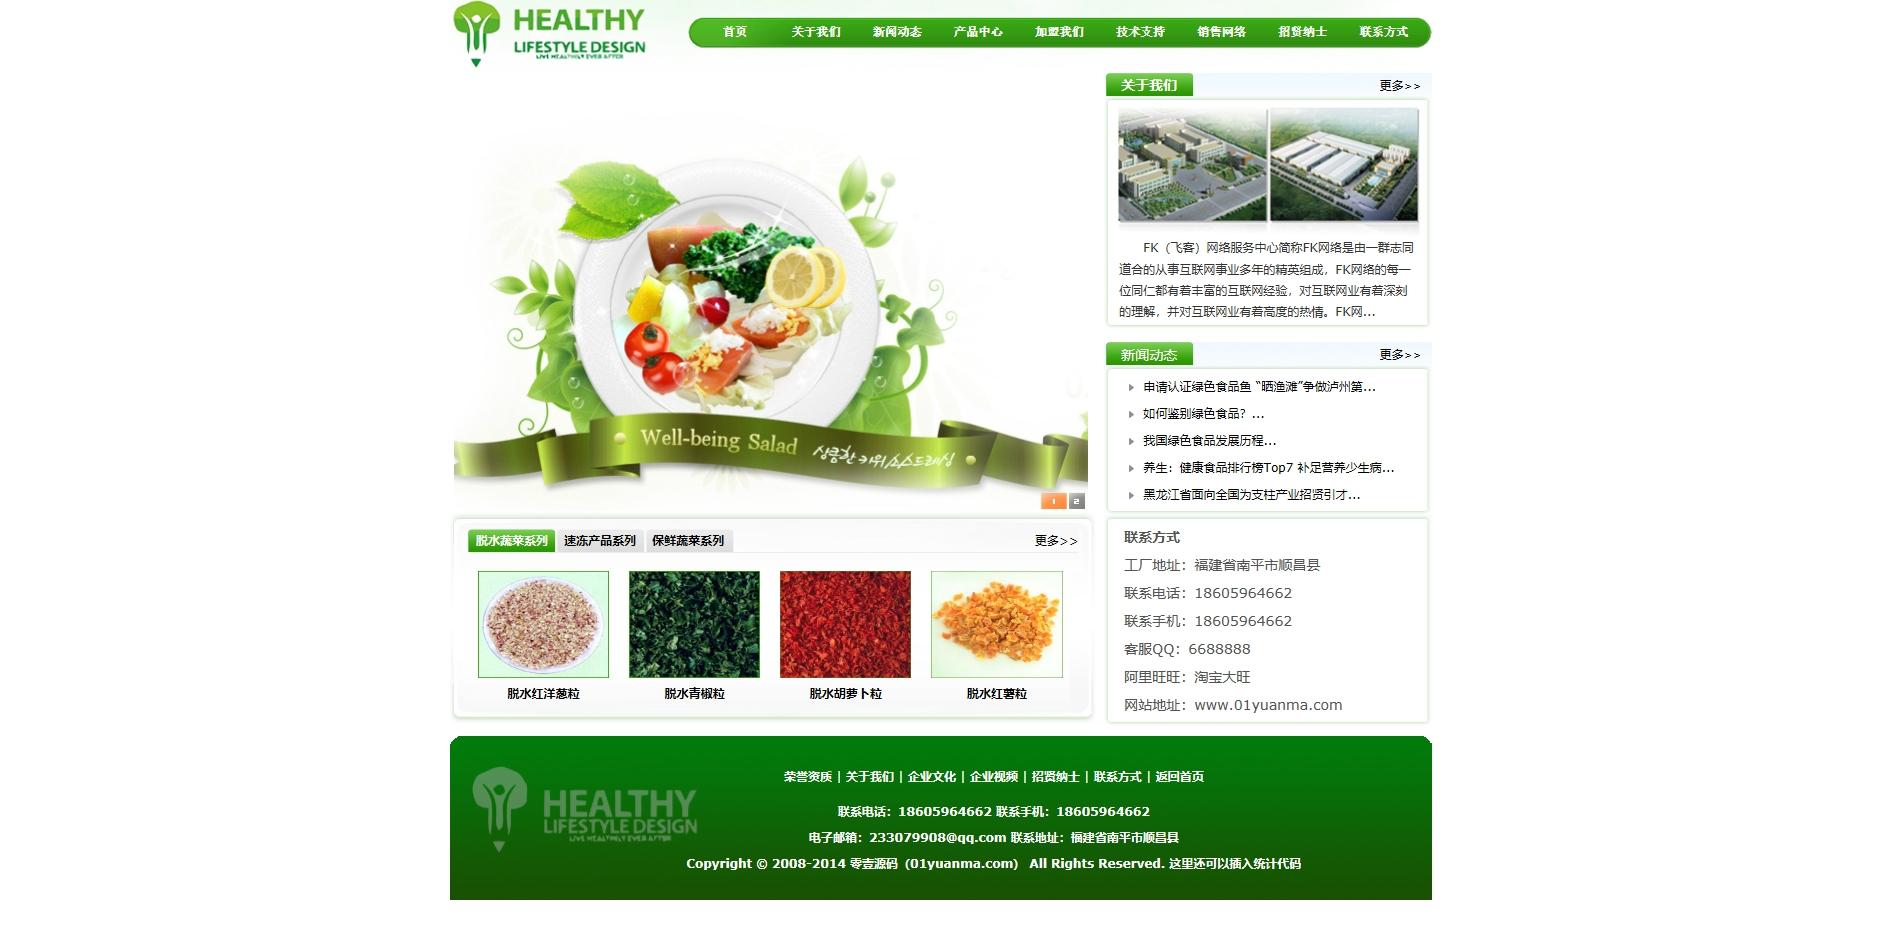 织梦dedecms绿色食品企业dede模板